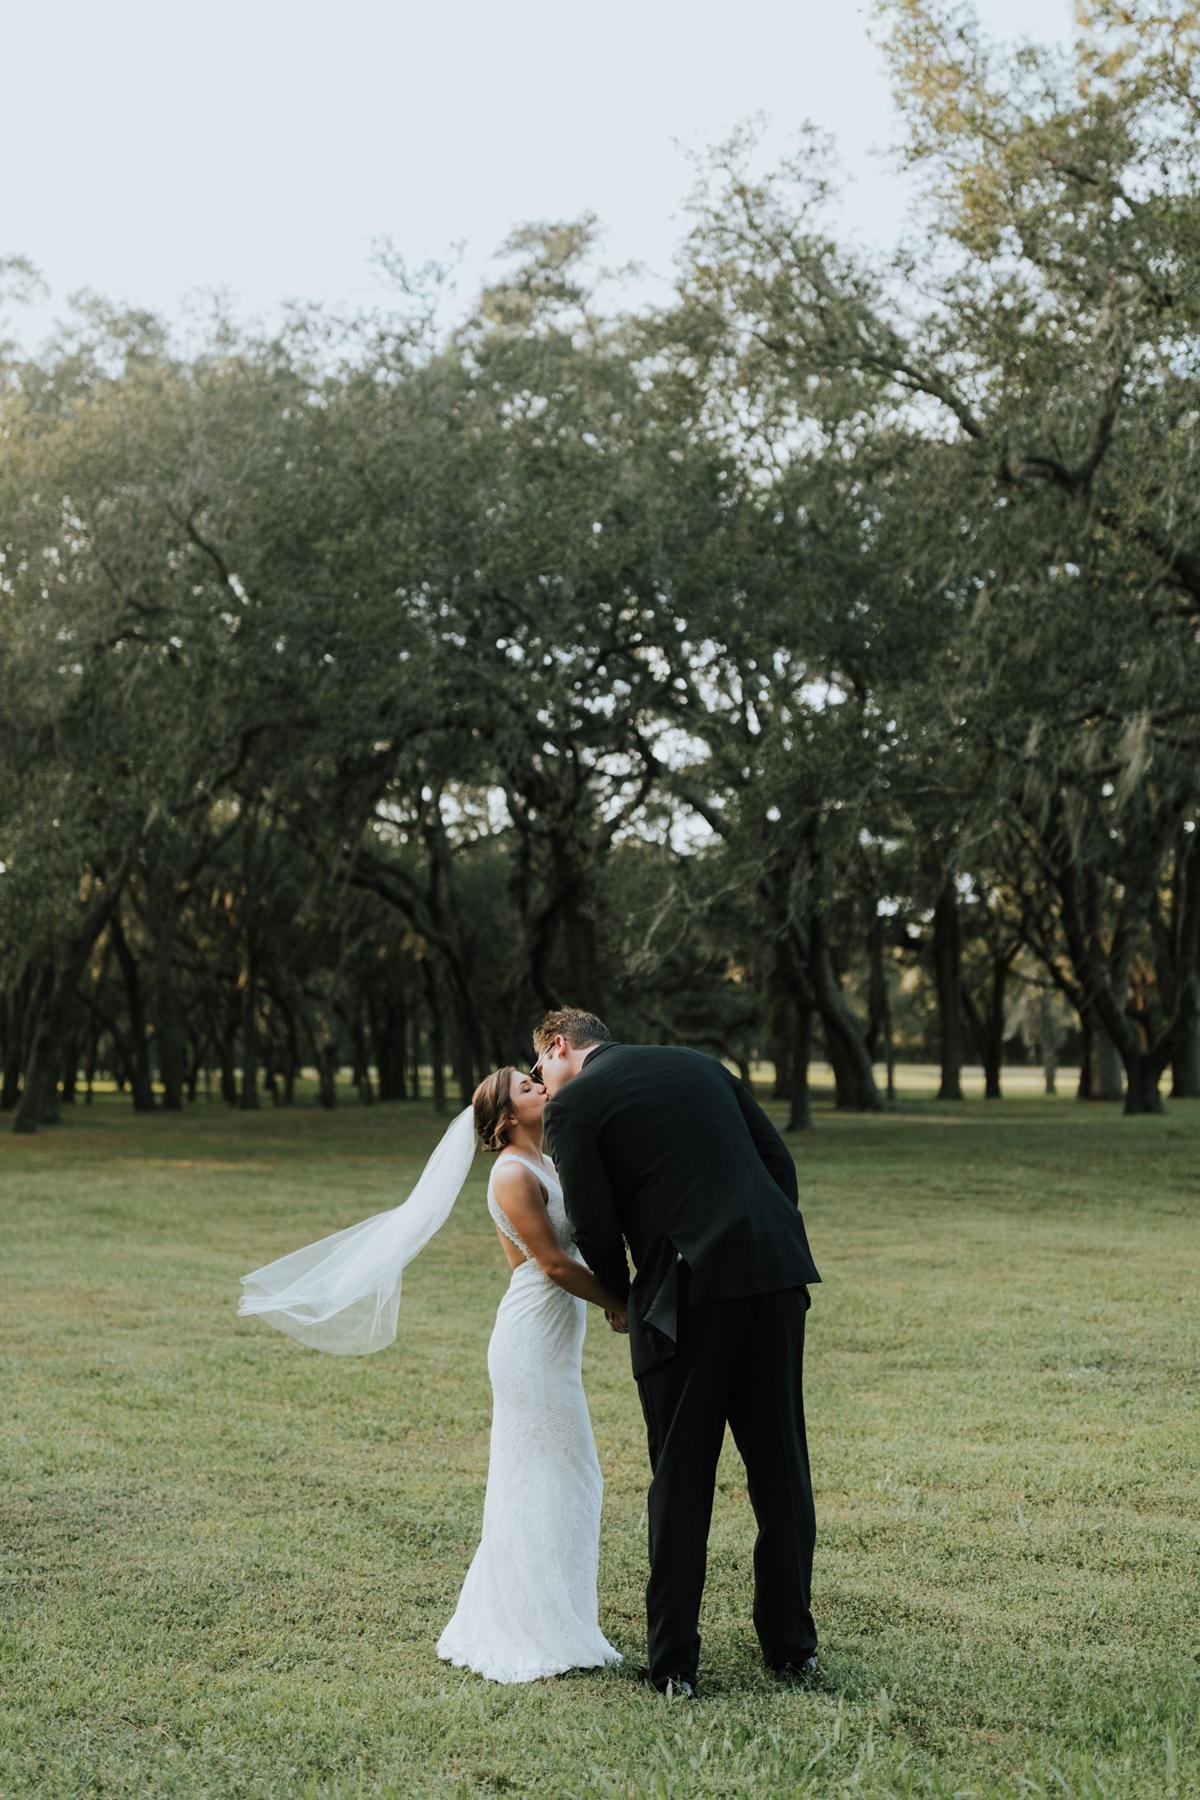 Tampa Area Florida Wedding Venue, Stonebridge at The Lange Farm_0143.jpg